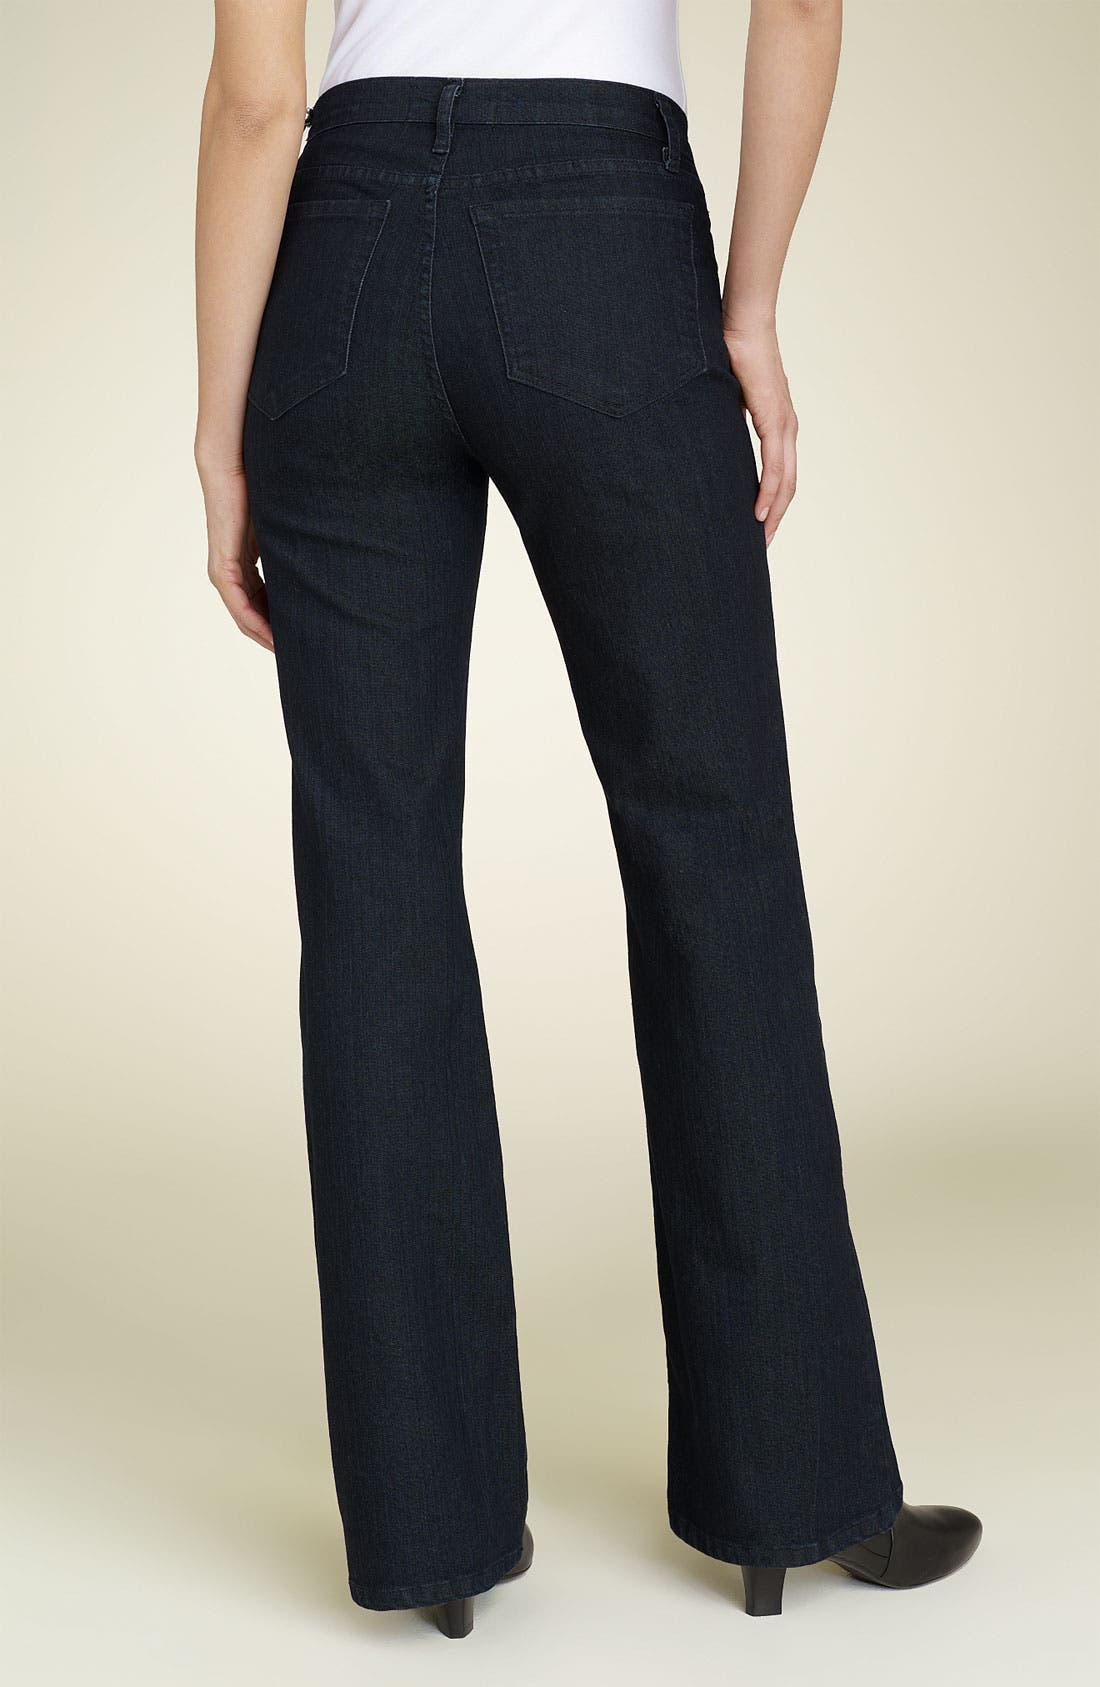 Alternate Image 2  - NYDJ 'Basic' Bootcut Stretch Jeans (Long)